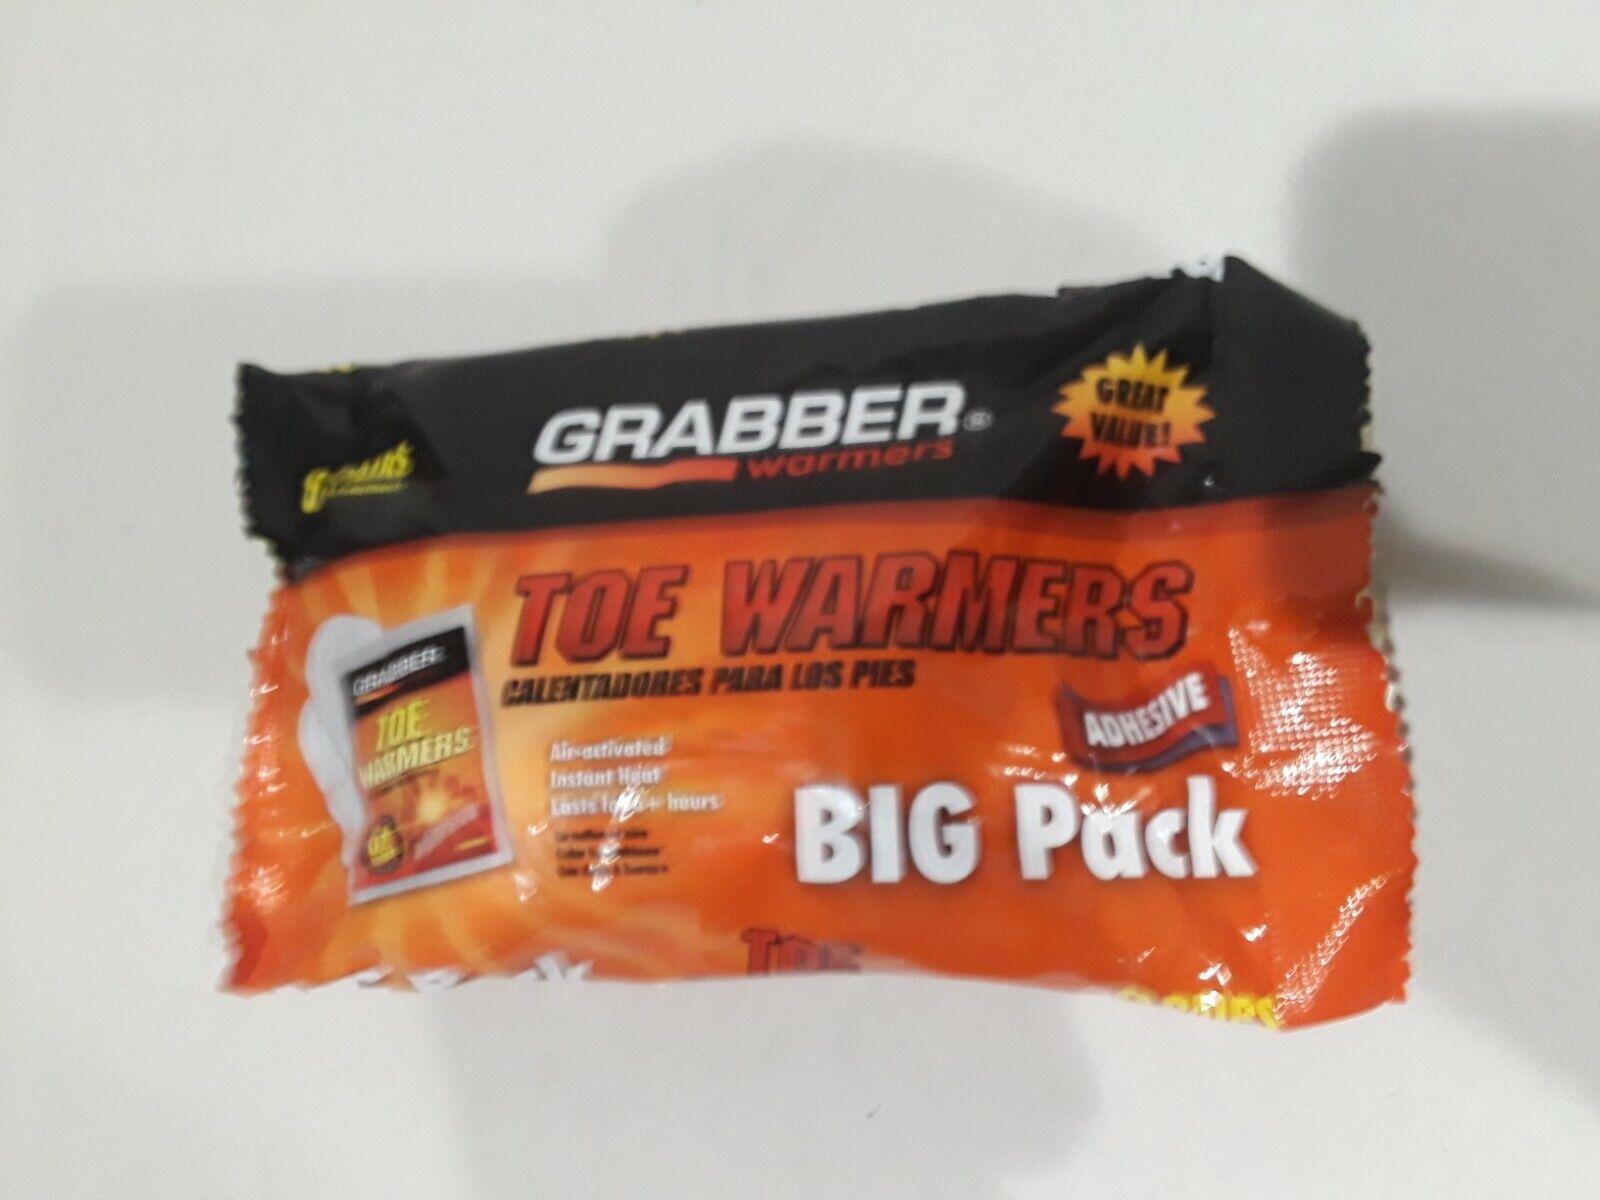 NEW GRABBER TWES8 FRESH BIG PACK 8 PAIRS FRESH TOE WARMERS GREAT SALE PRICE